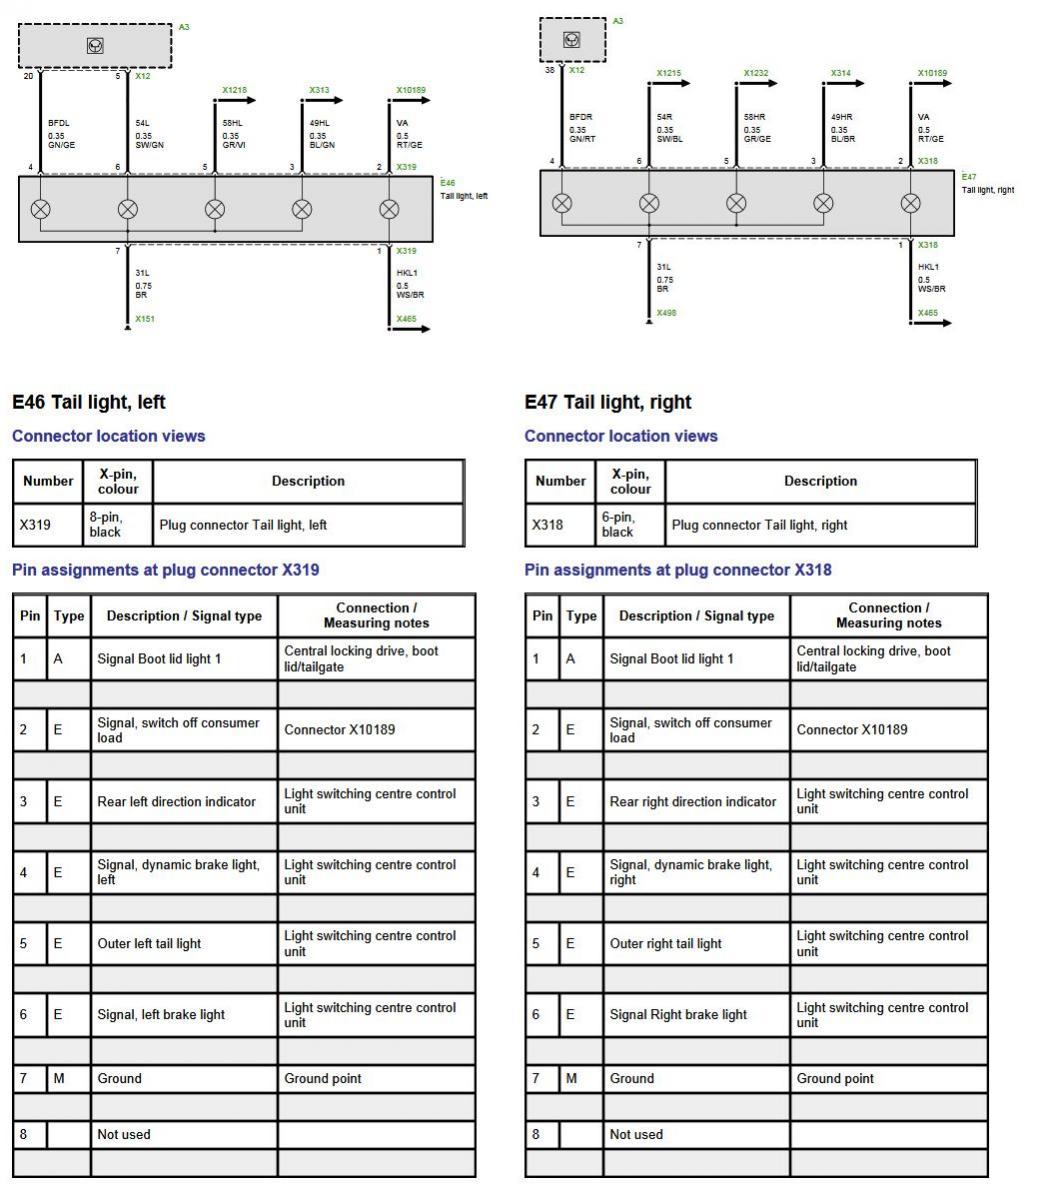 bmw e39 radio wiring diagram filtration through filter paper, Wiring diagram